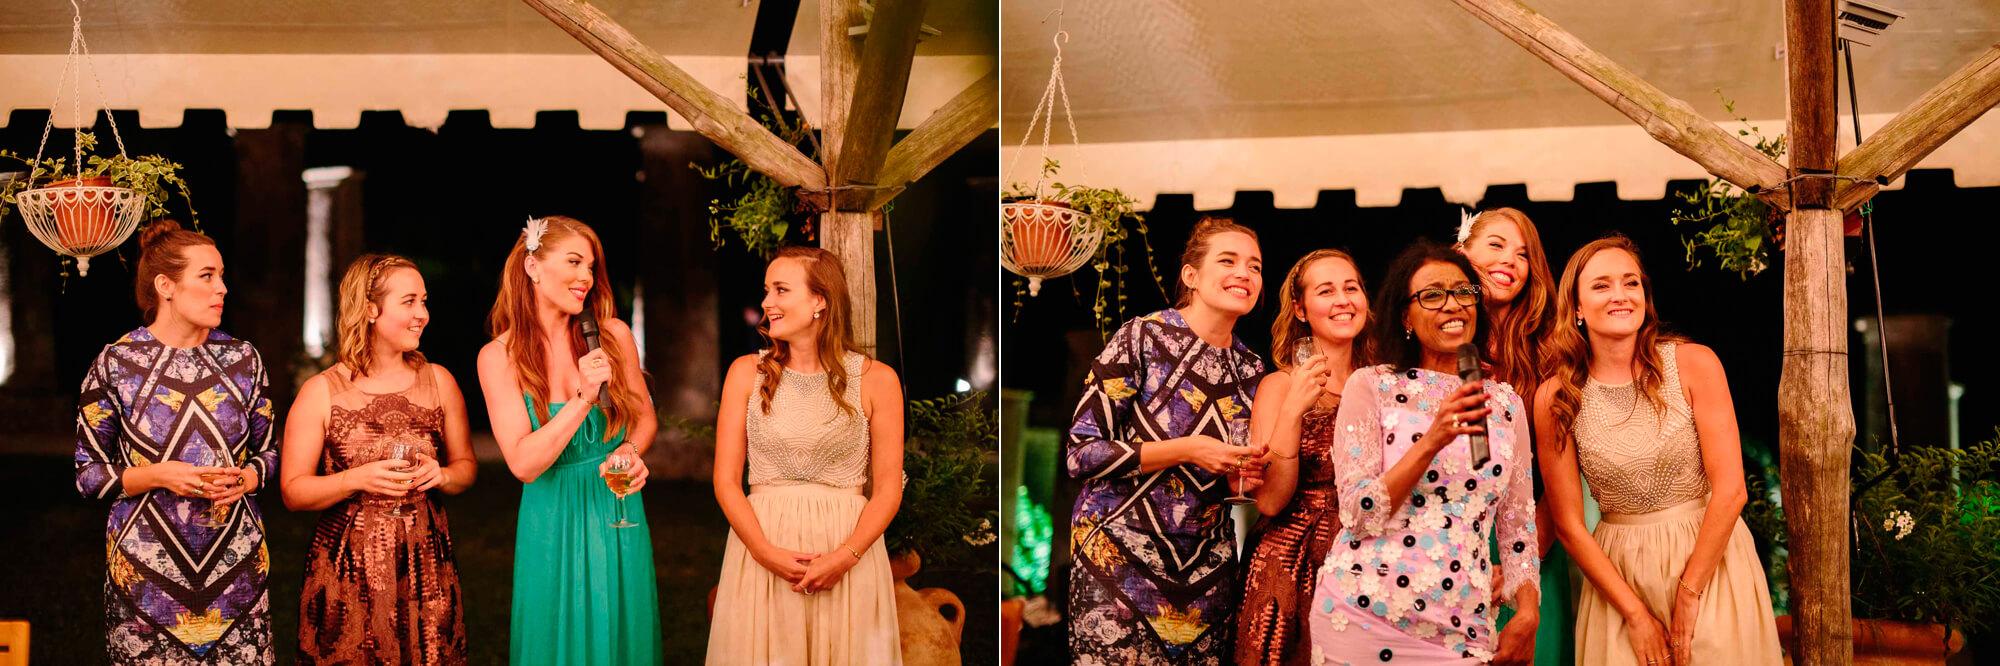 148-sorrento-wedding-photographer.jpg